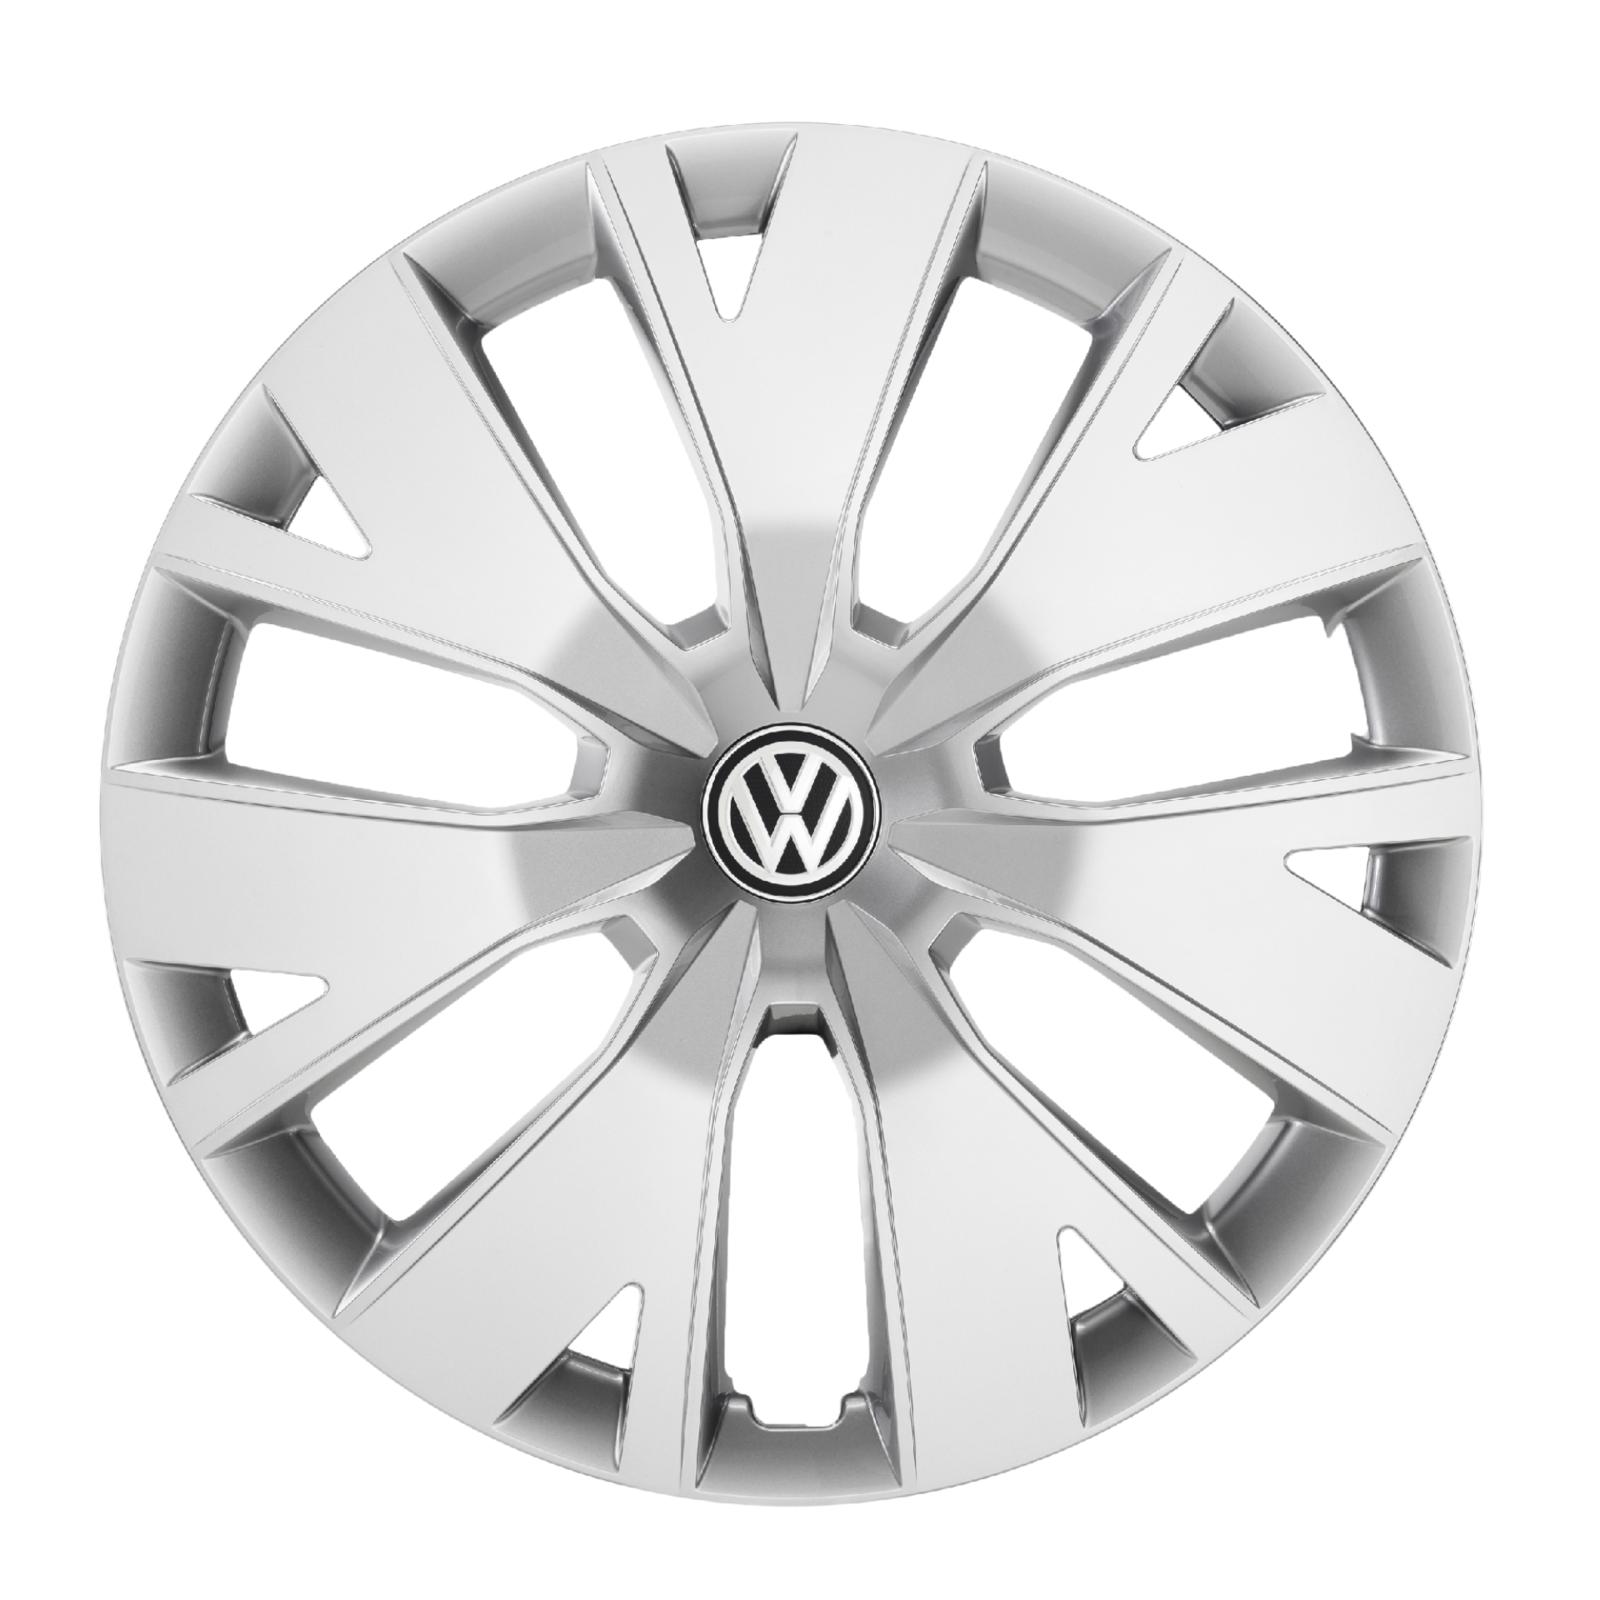 Original VW T-Cross Radkappen Set 16 Zoll Radzierblenden Brillantsilber 2GM071456